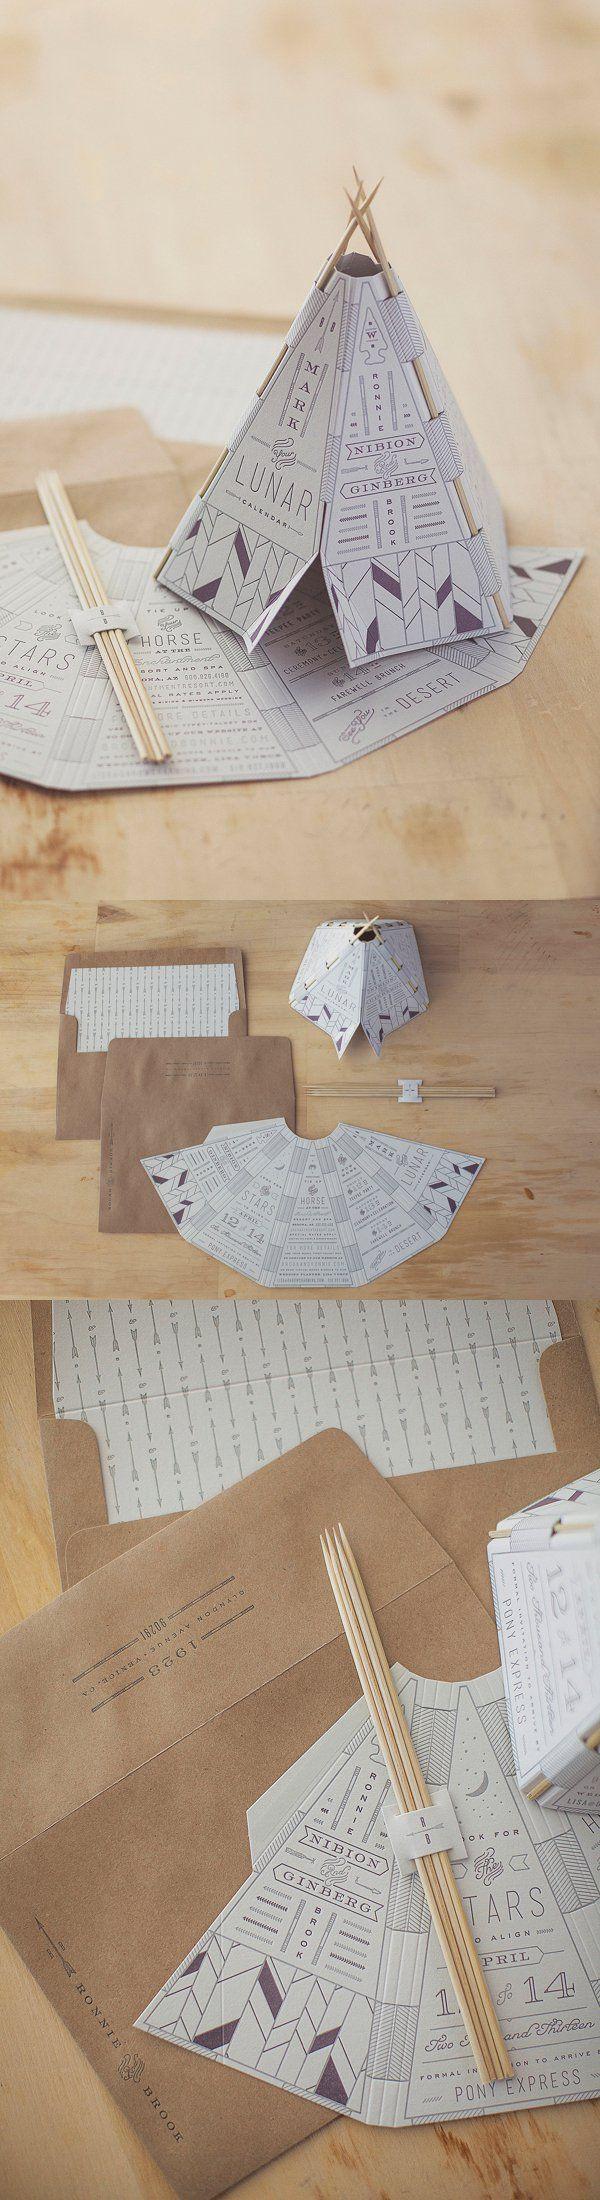 50 Stunning Custom Designed Print Invitations To Inspire Your Next Big Event – Design School